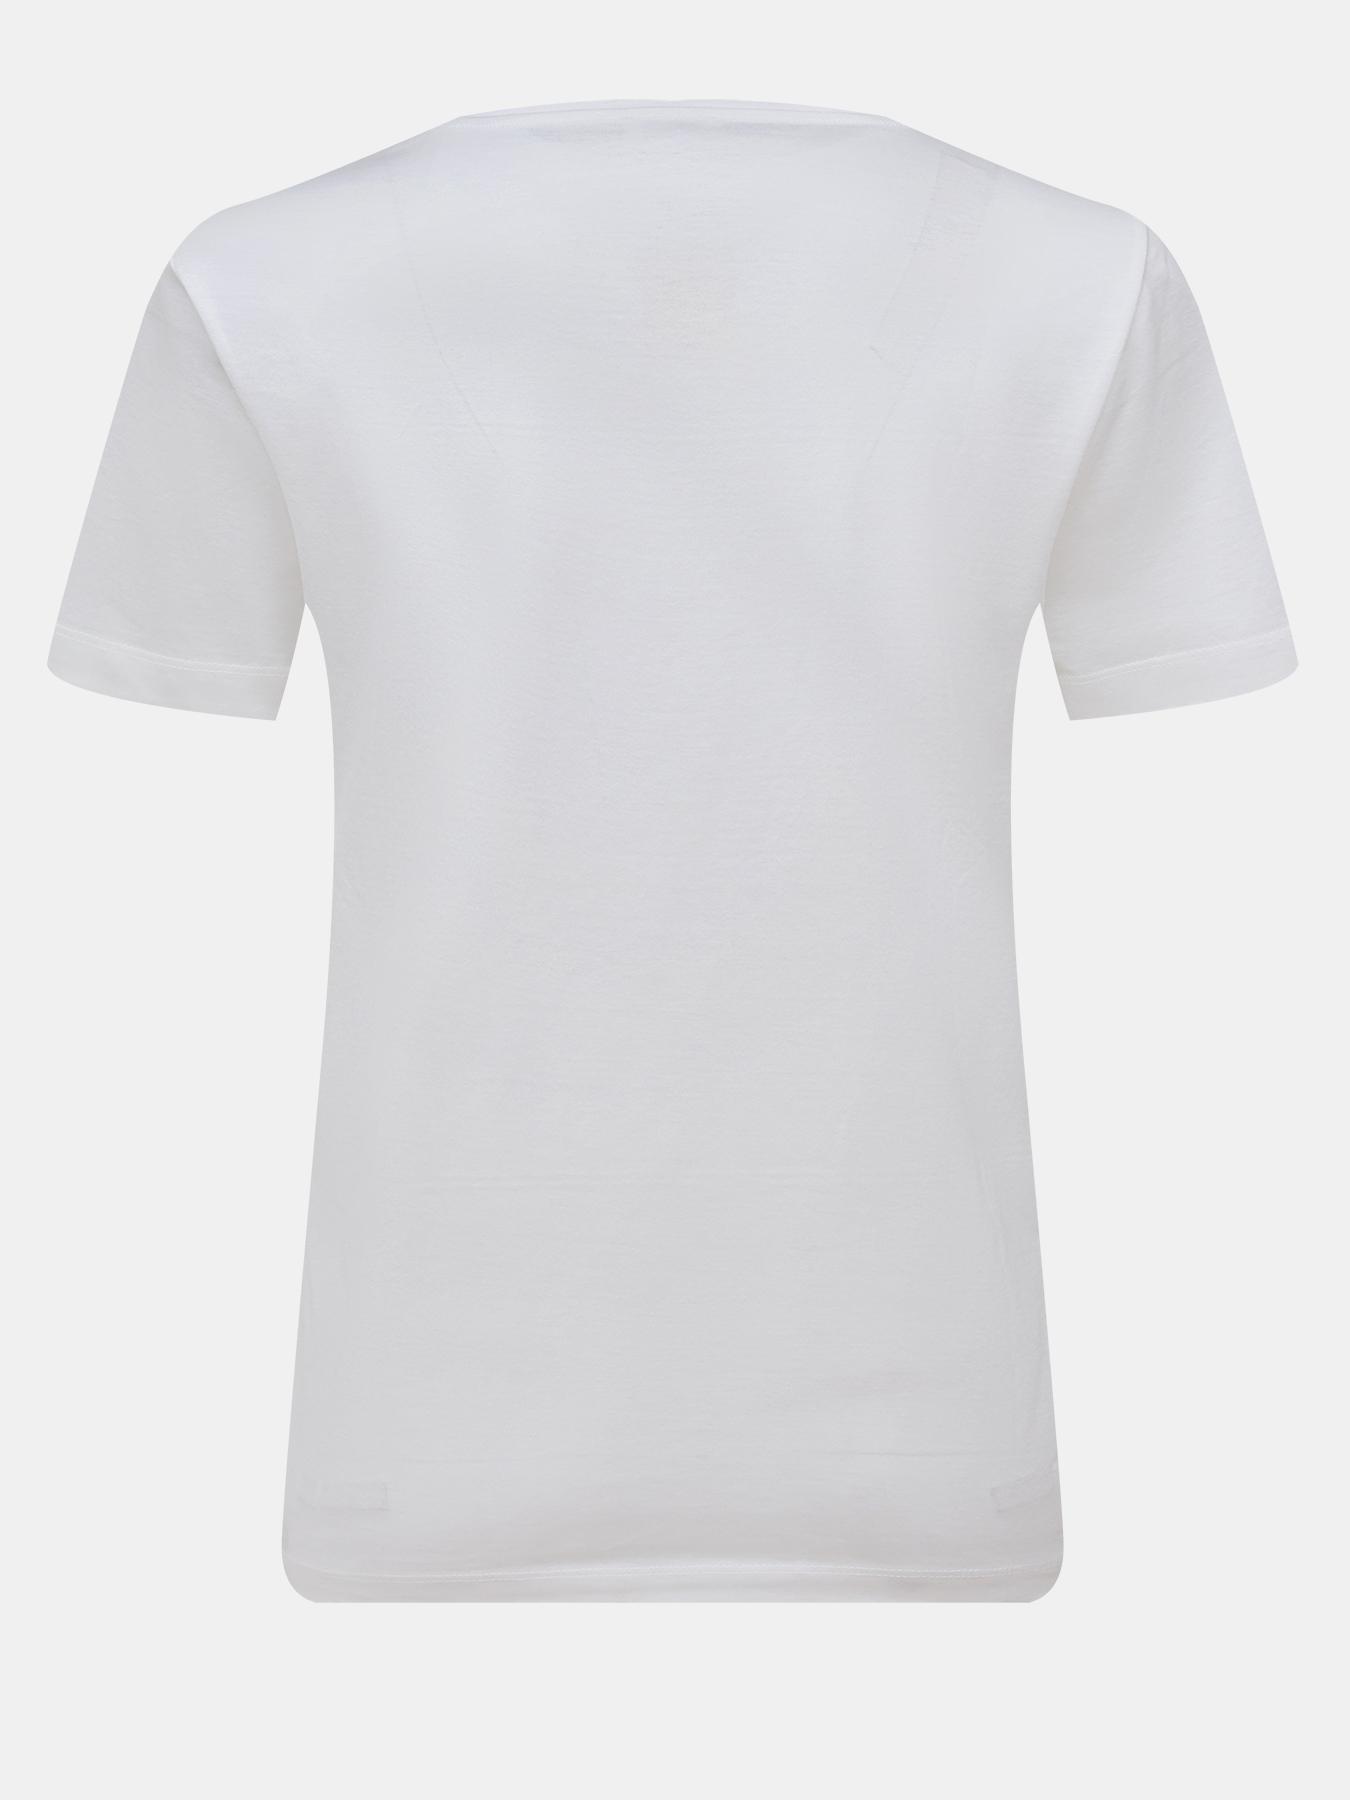 Фуфайка (футболка) Gerry Weber Футболка юбка gerry weber gerry weber ge002ewccil0